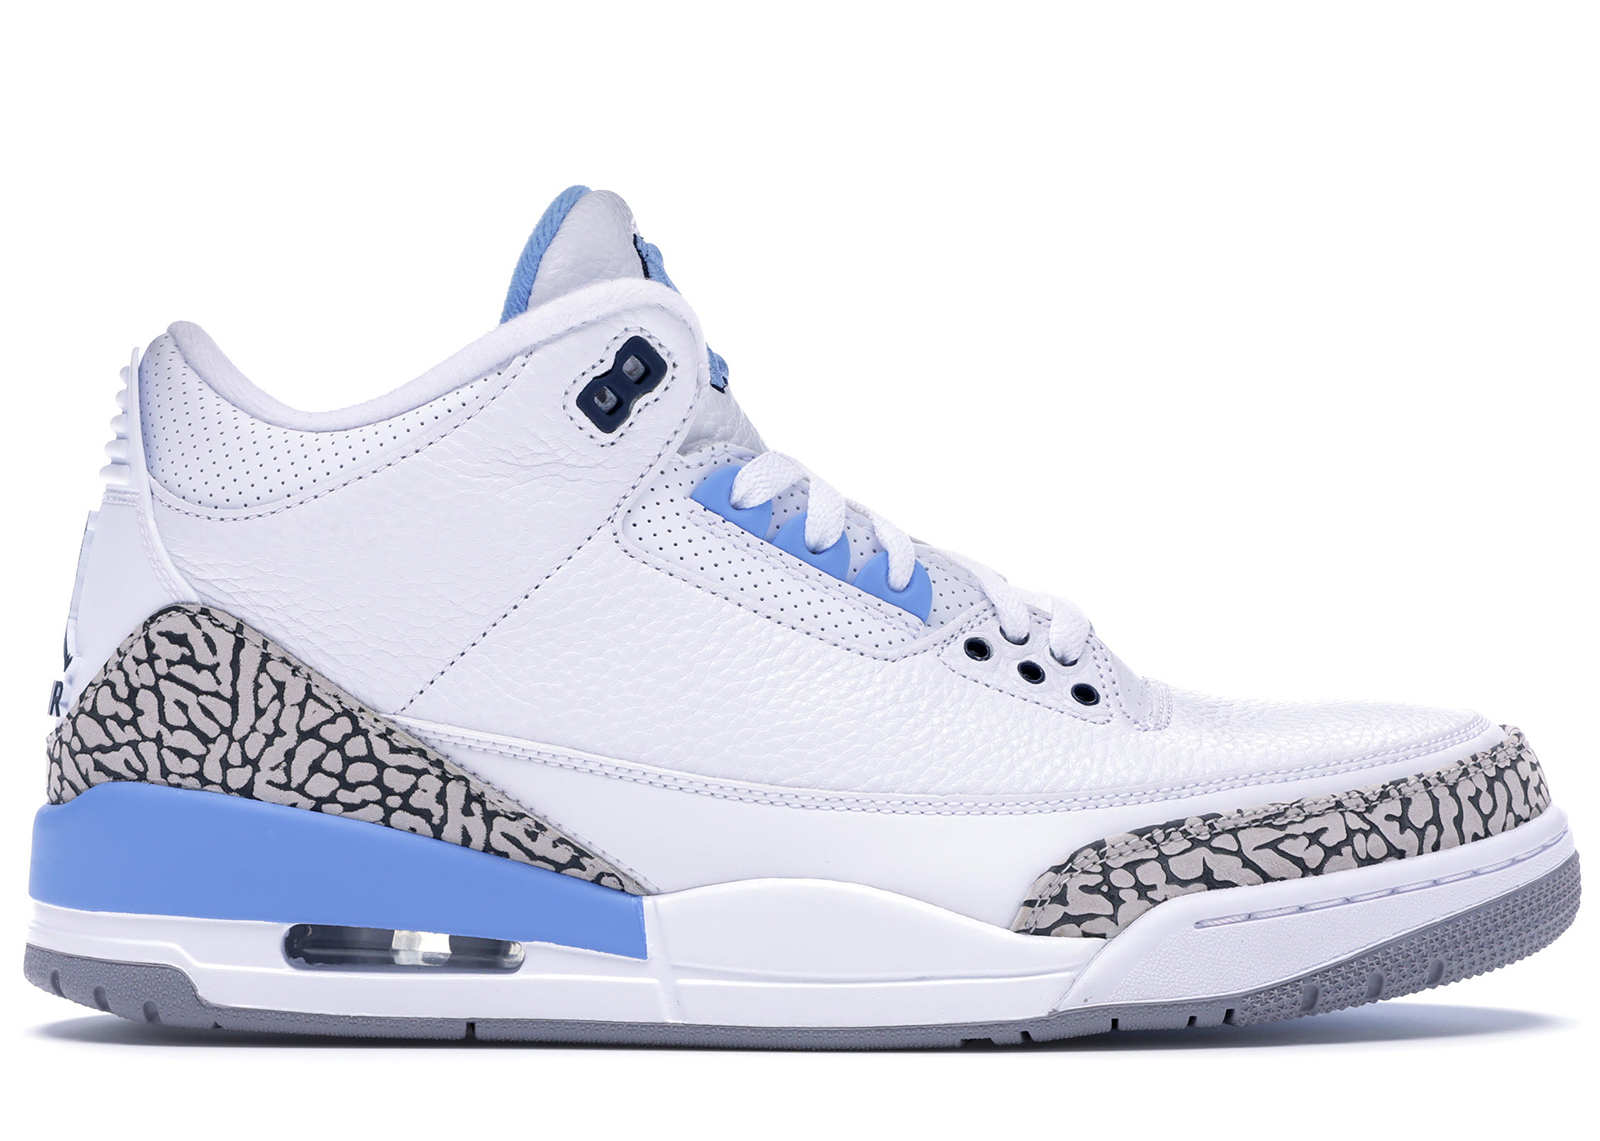 Jordan 3 Retro UNC PE - Sneakers